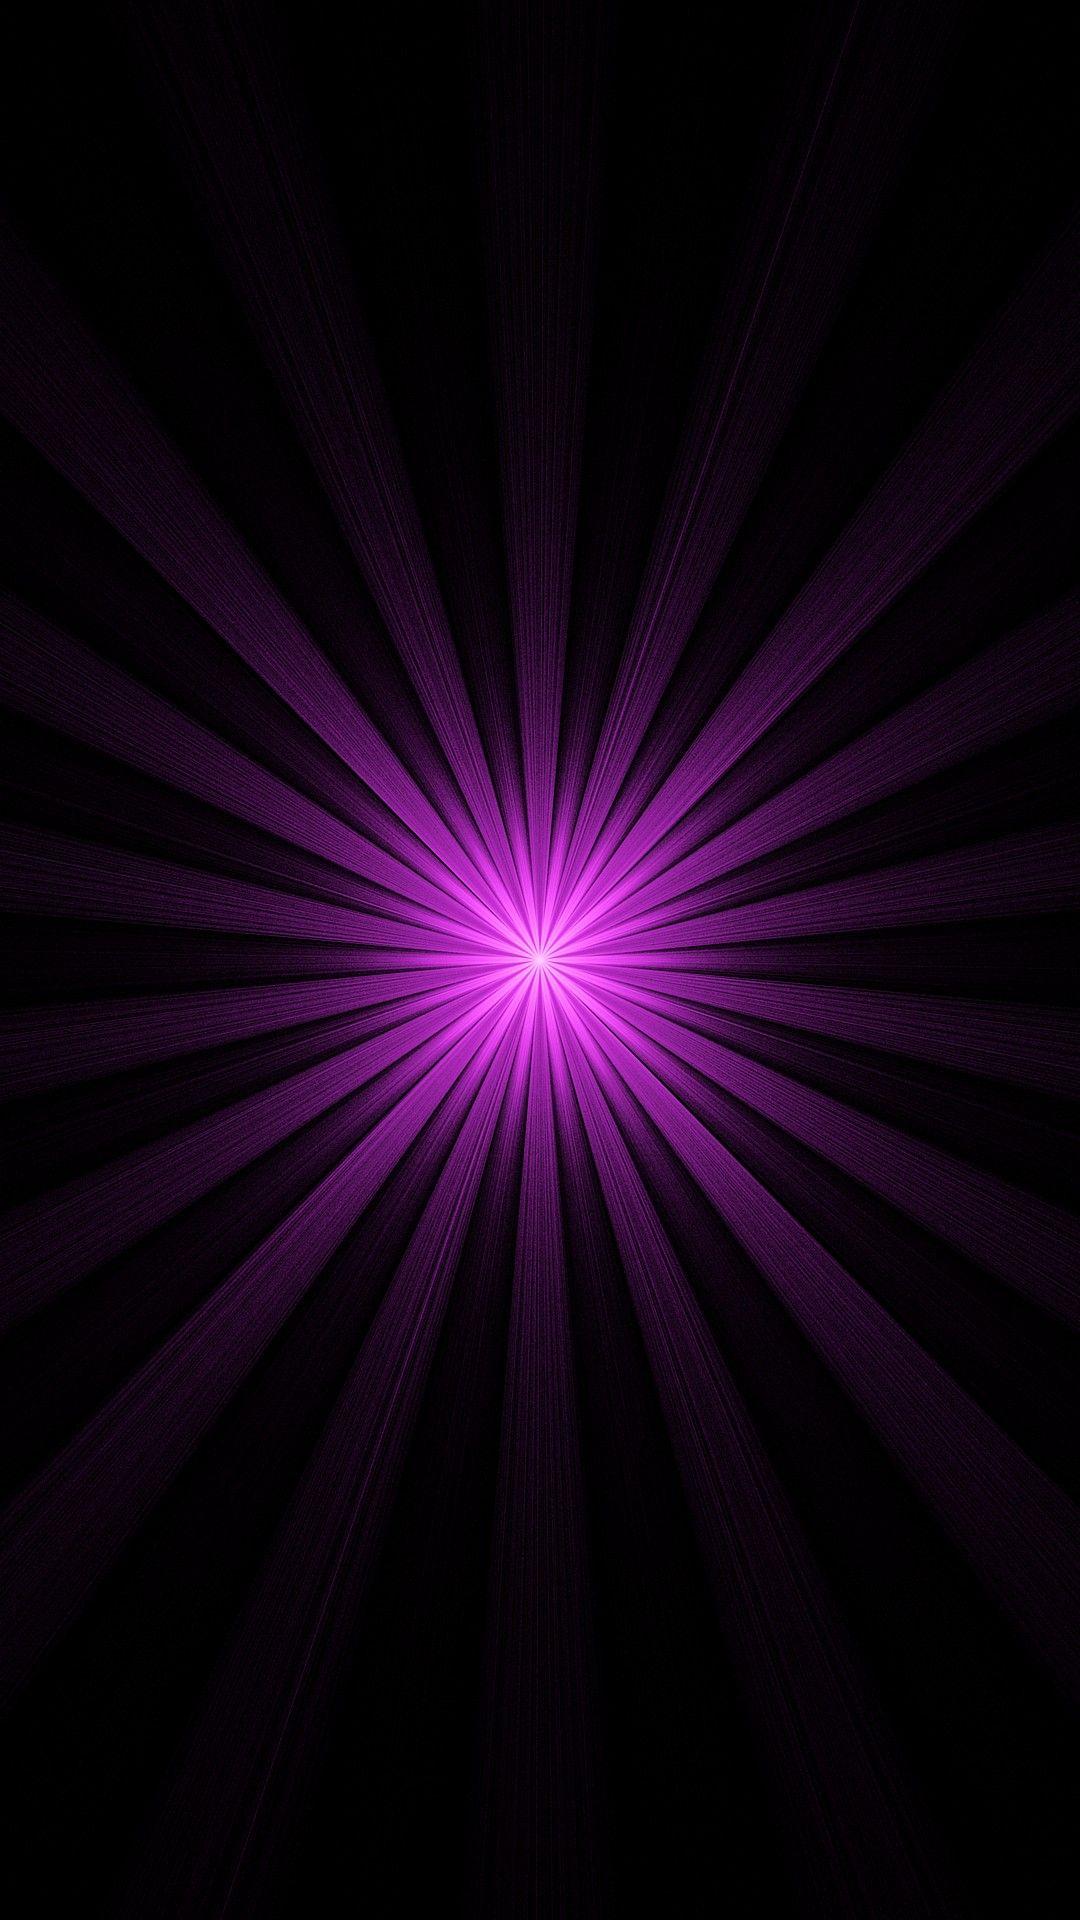 Violet Purple Light Technology Magenta Visual Effect Lighting Iphone Wallpaper Dark Purple Wallpaper Purple Wallpaper Cool Wallpapers For Phones